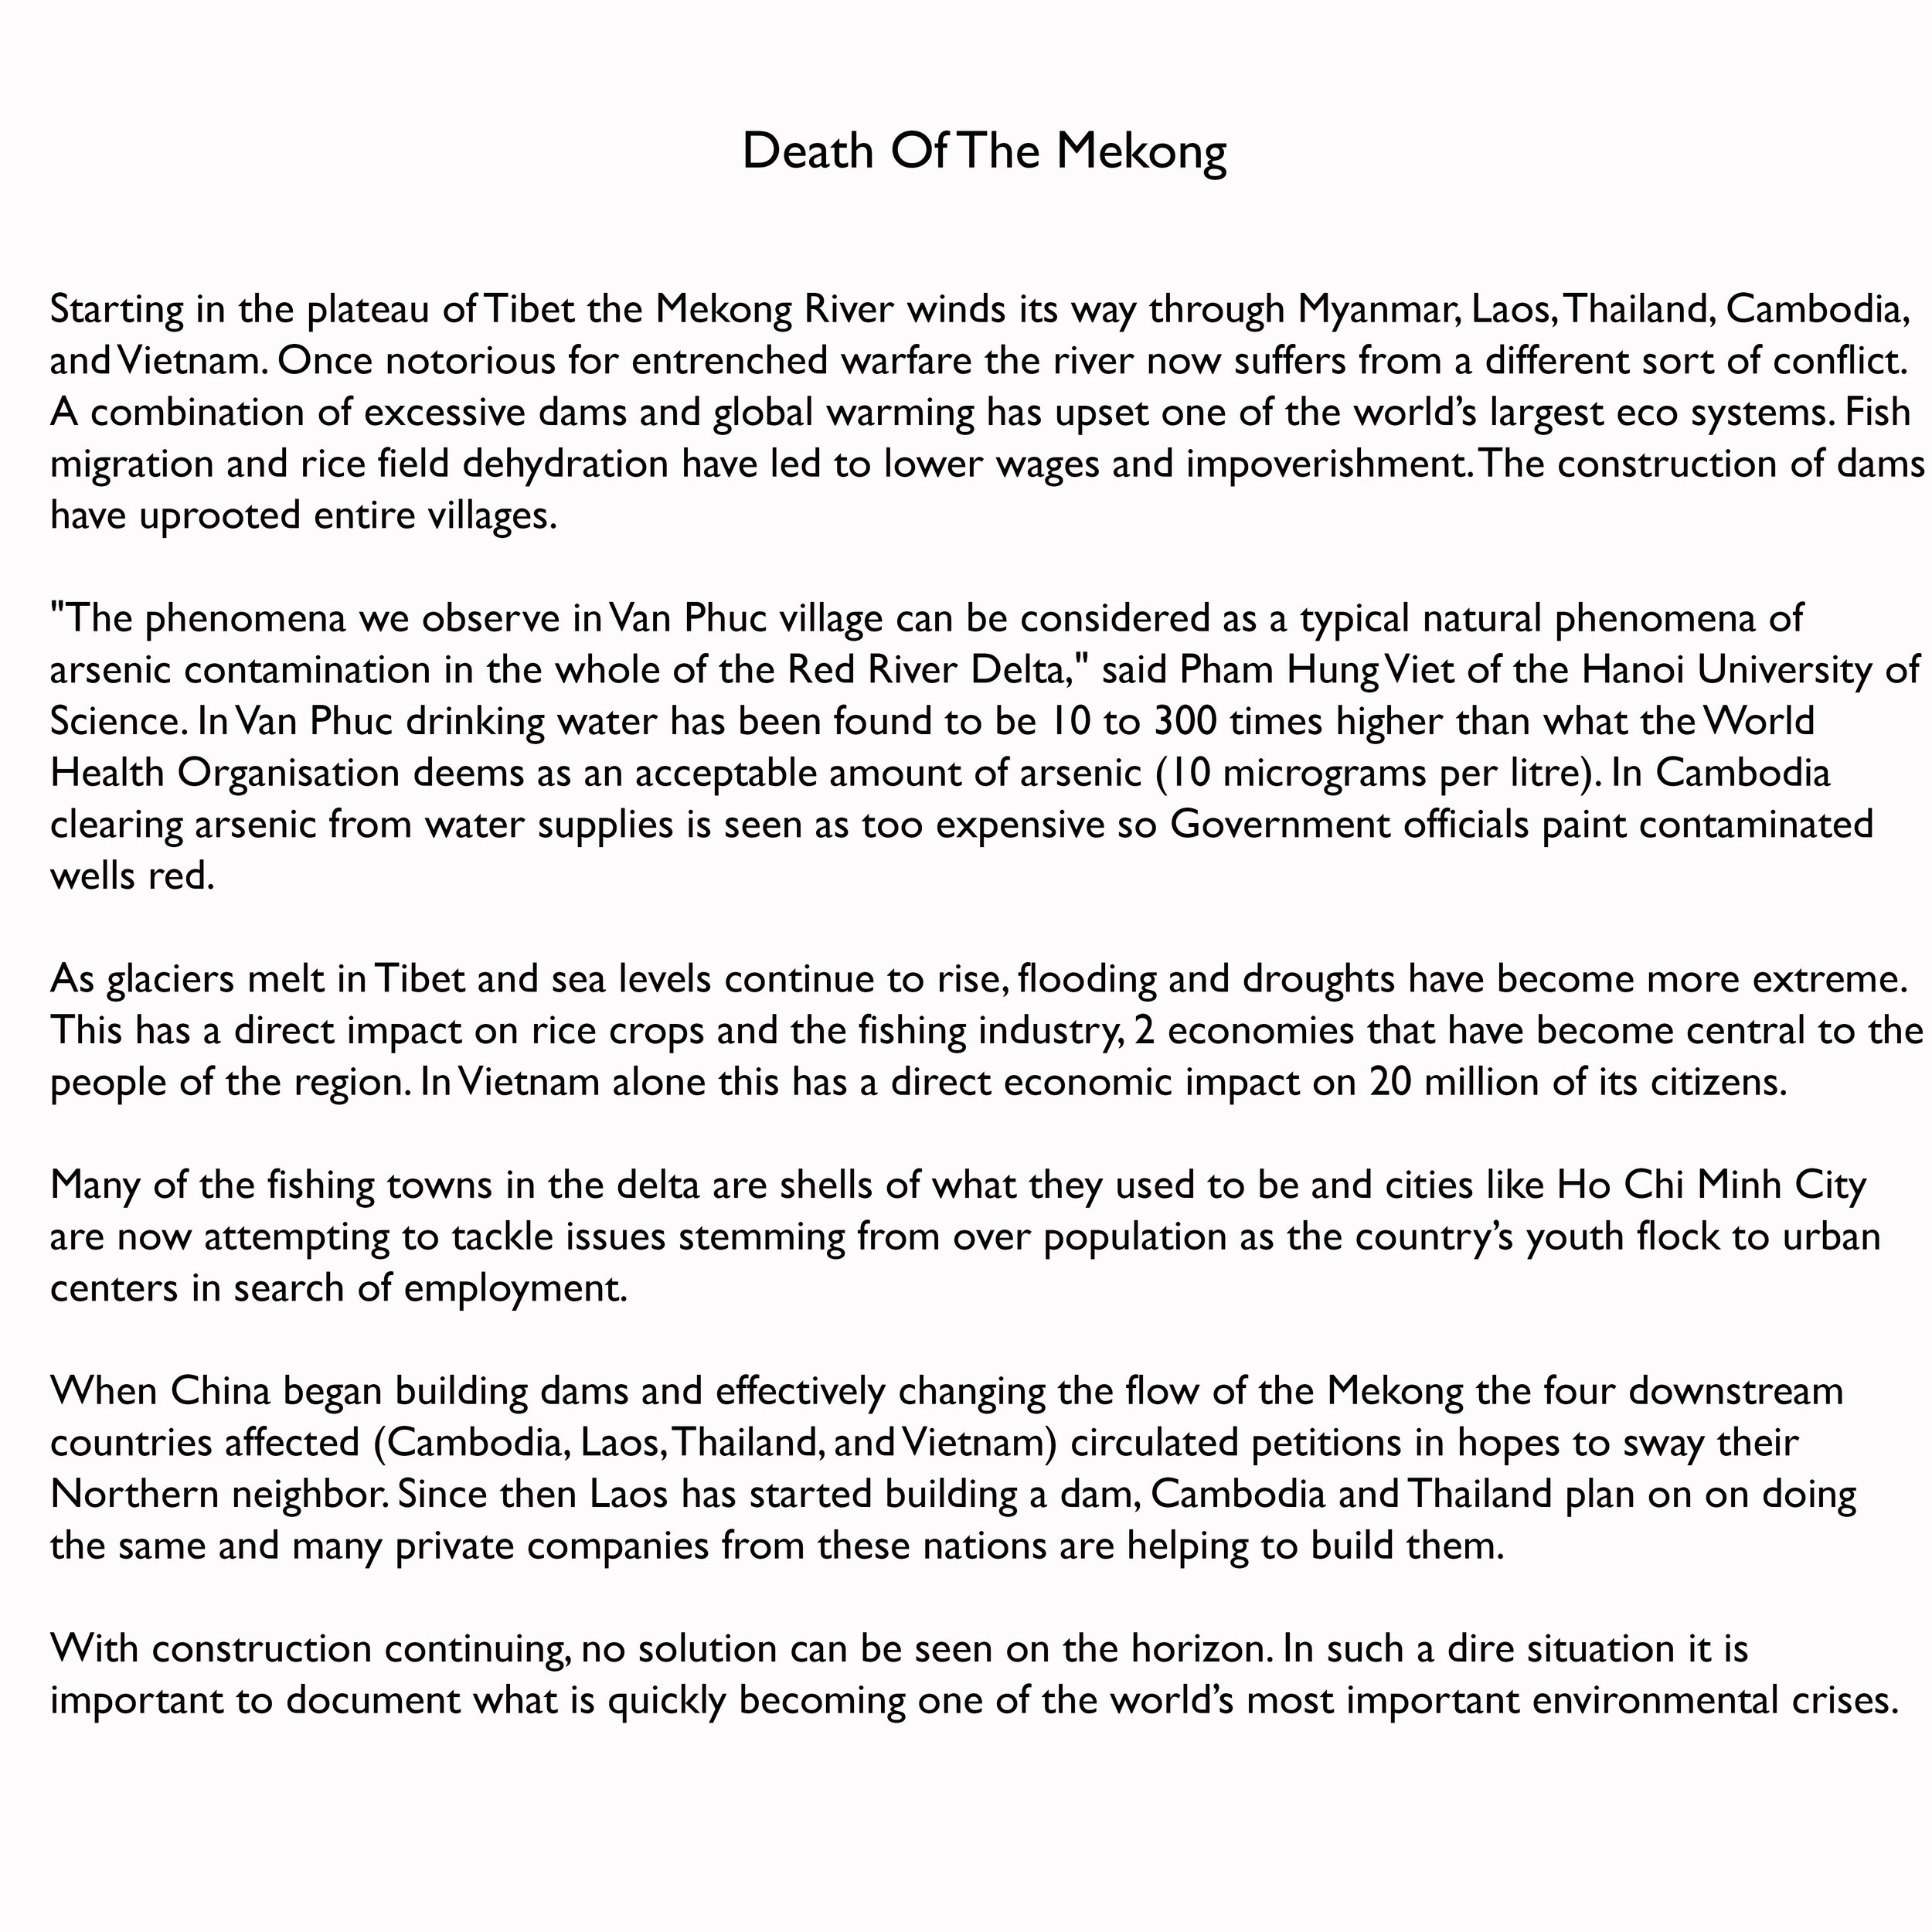 Mekong_Statement.jpg